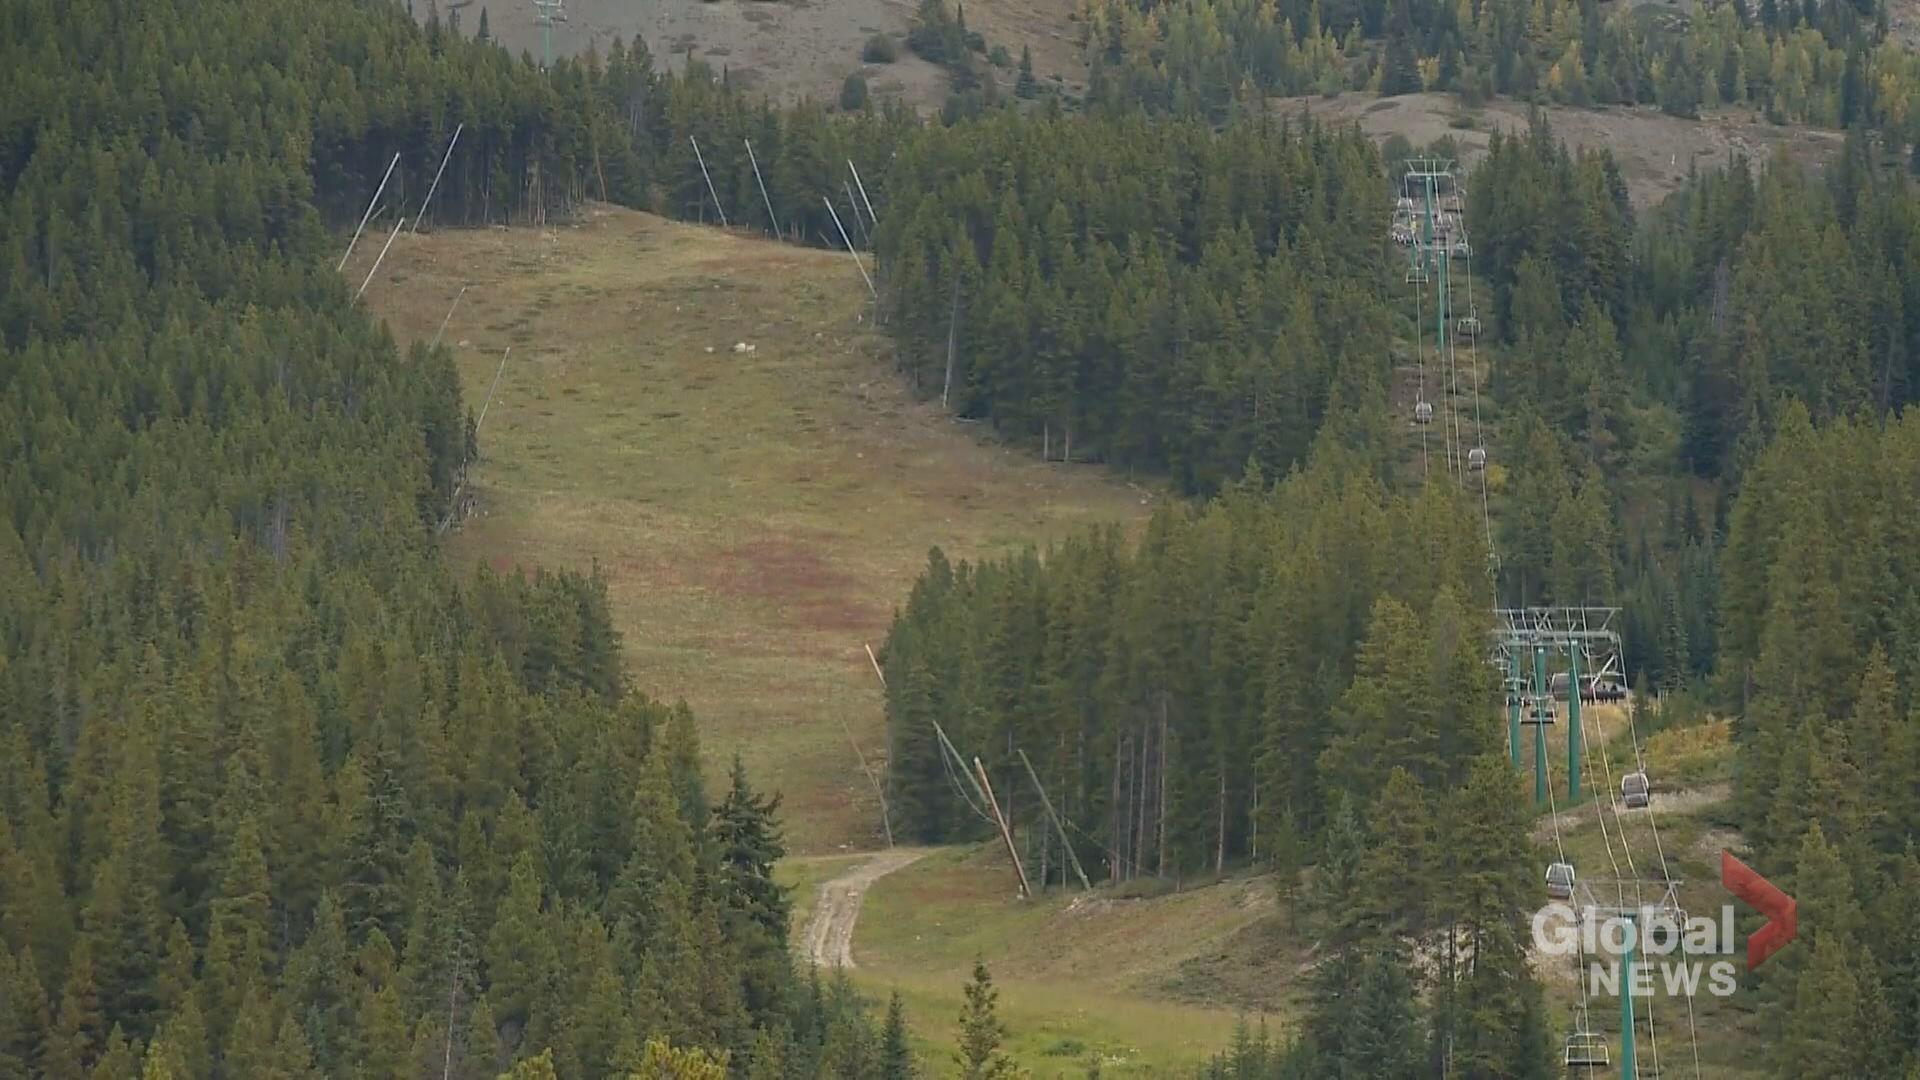 Big renovations approved for Lake Louise Ski Resort